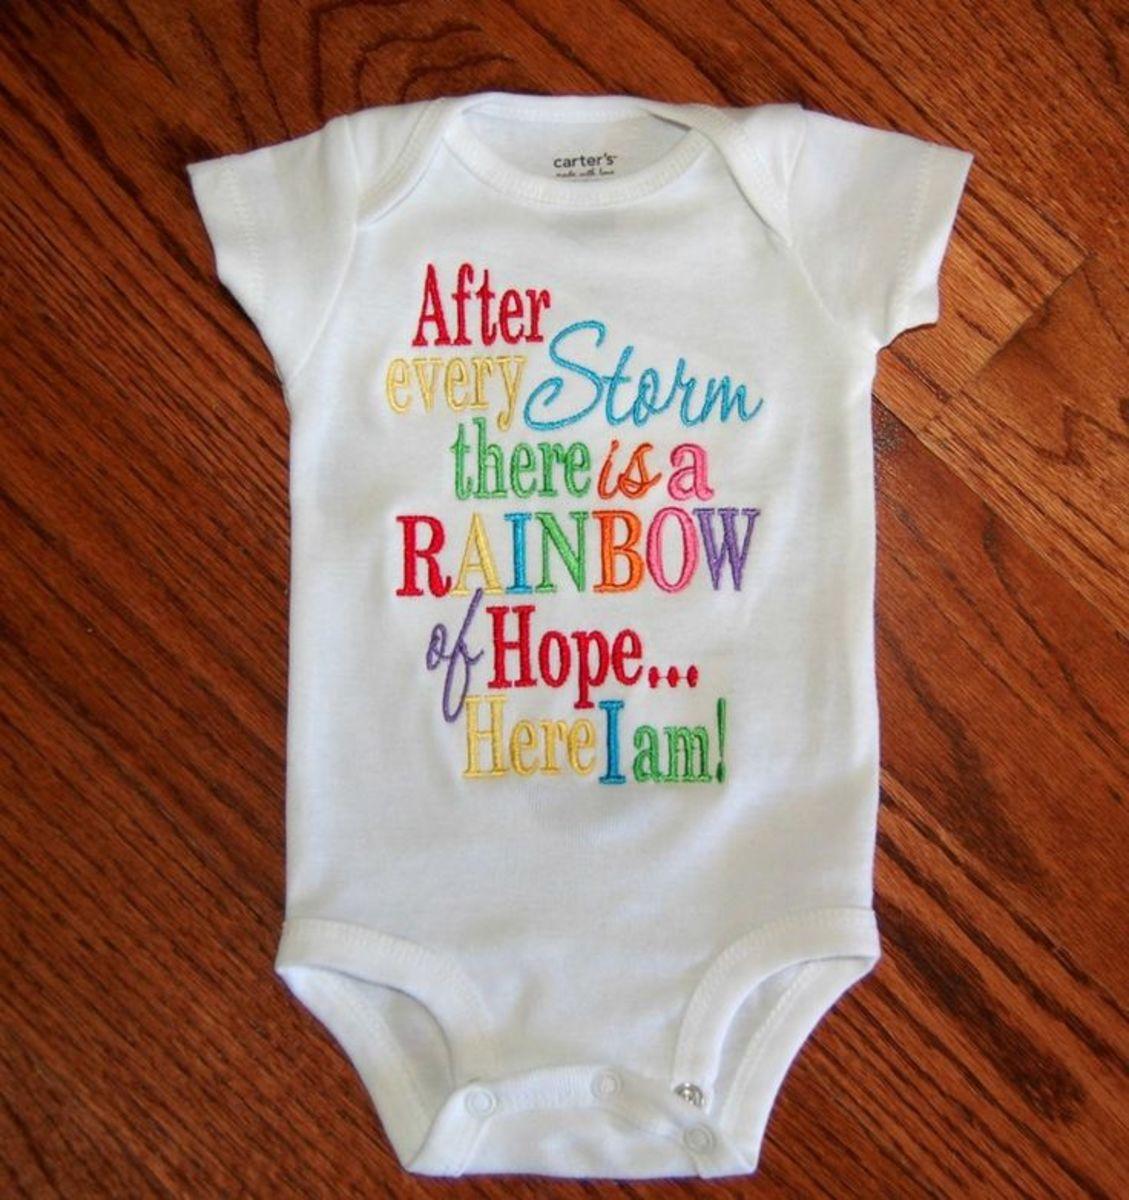 Journey to a Rainbow Baby | WeHaveKids